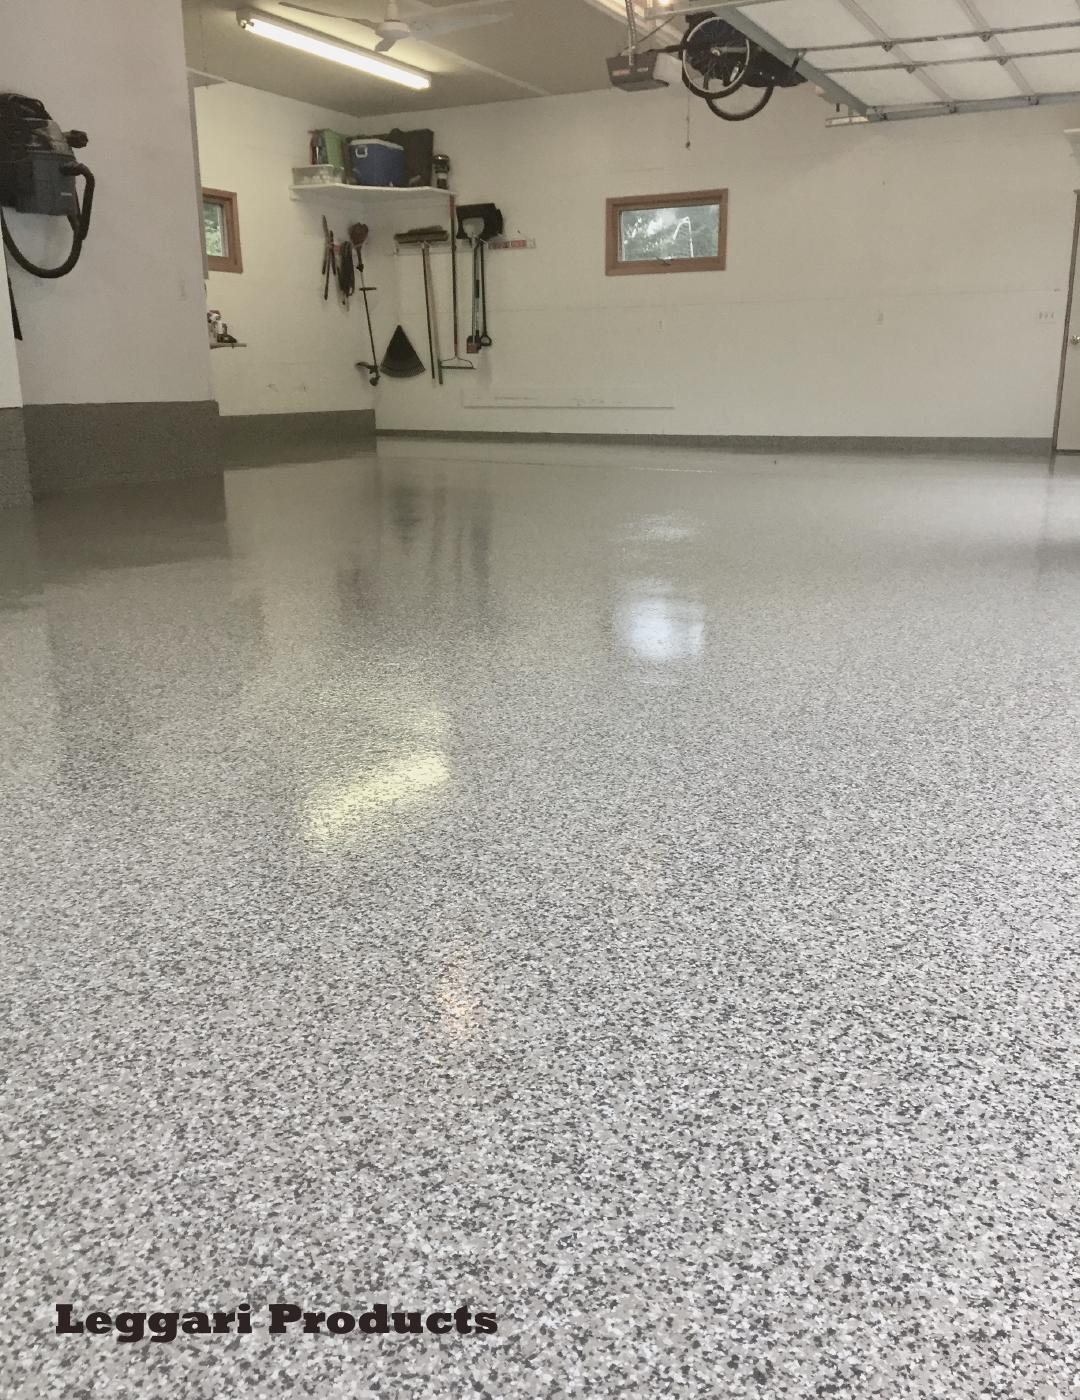 Pin By Leggari Products Diy Kits To On Garage Flooring In 2020 Epoxy Floor Coating Metallic Epoxy Floor Garage Floor Epoxy